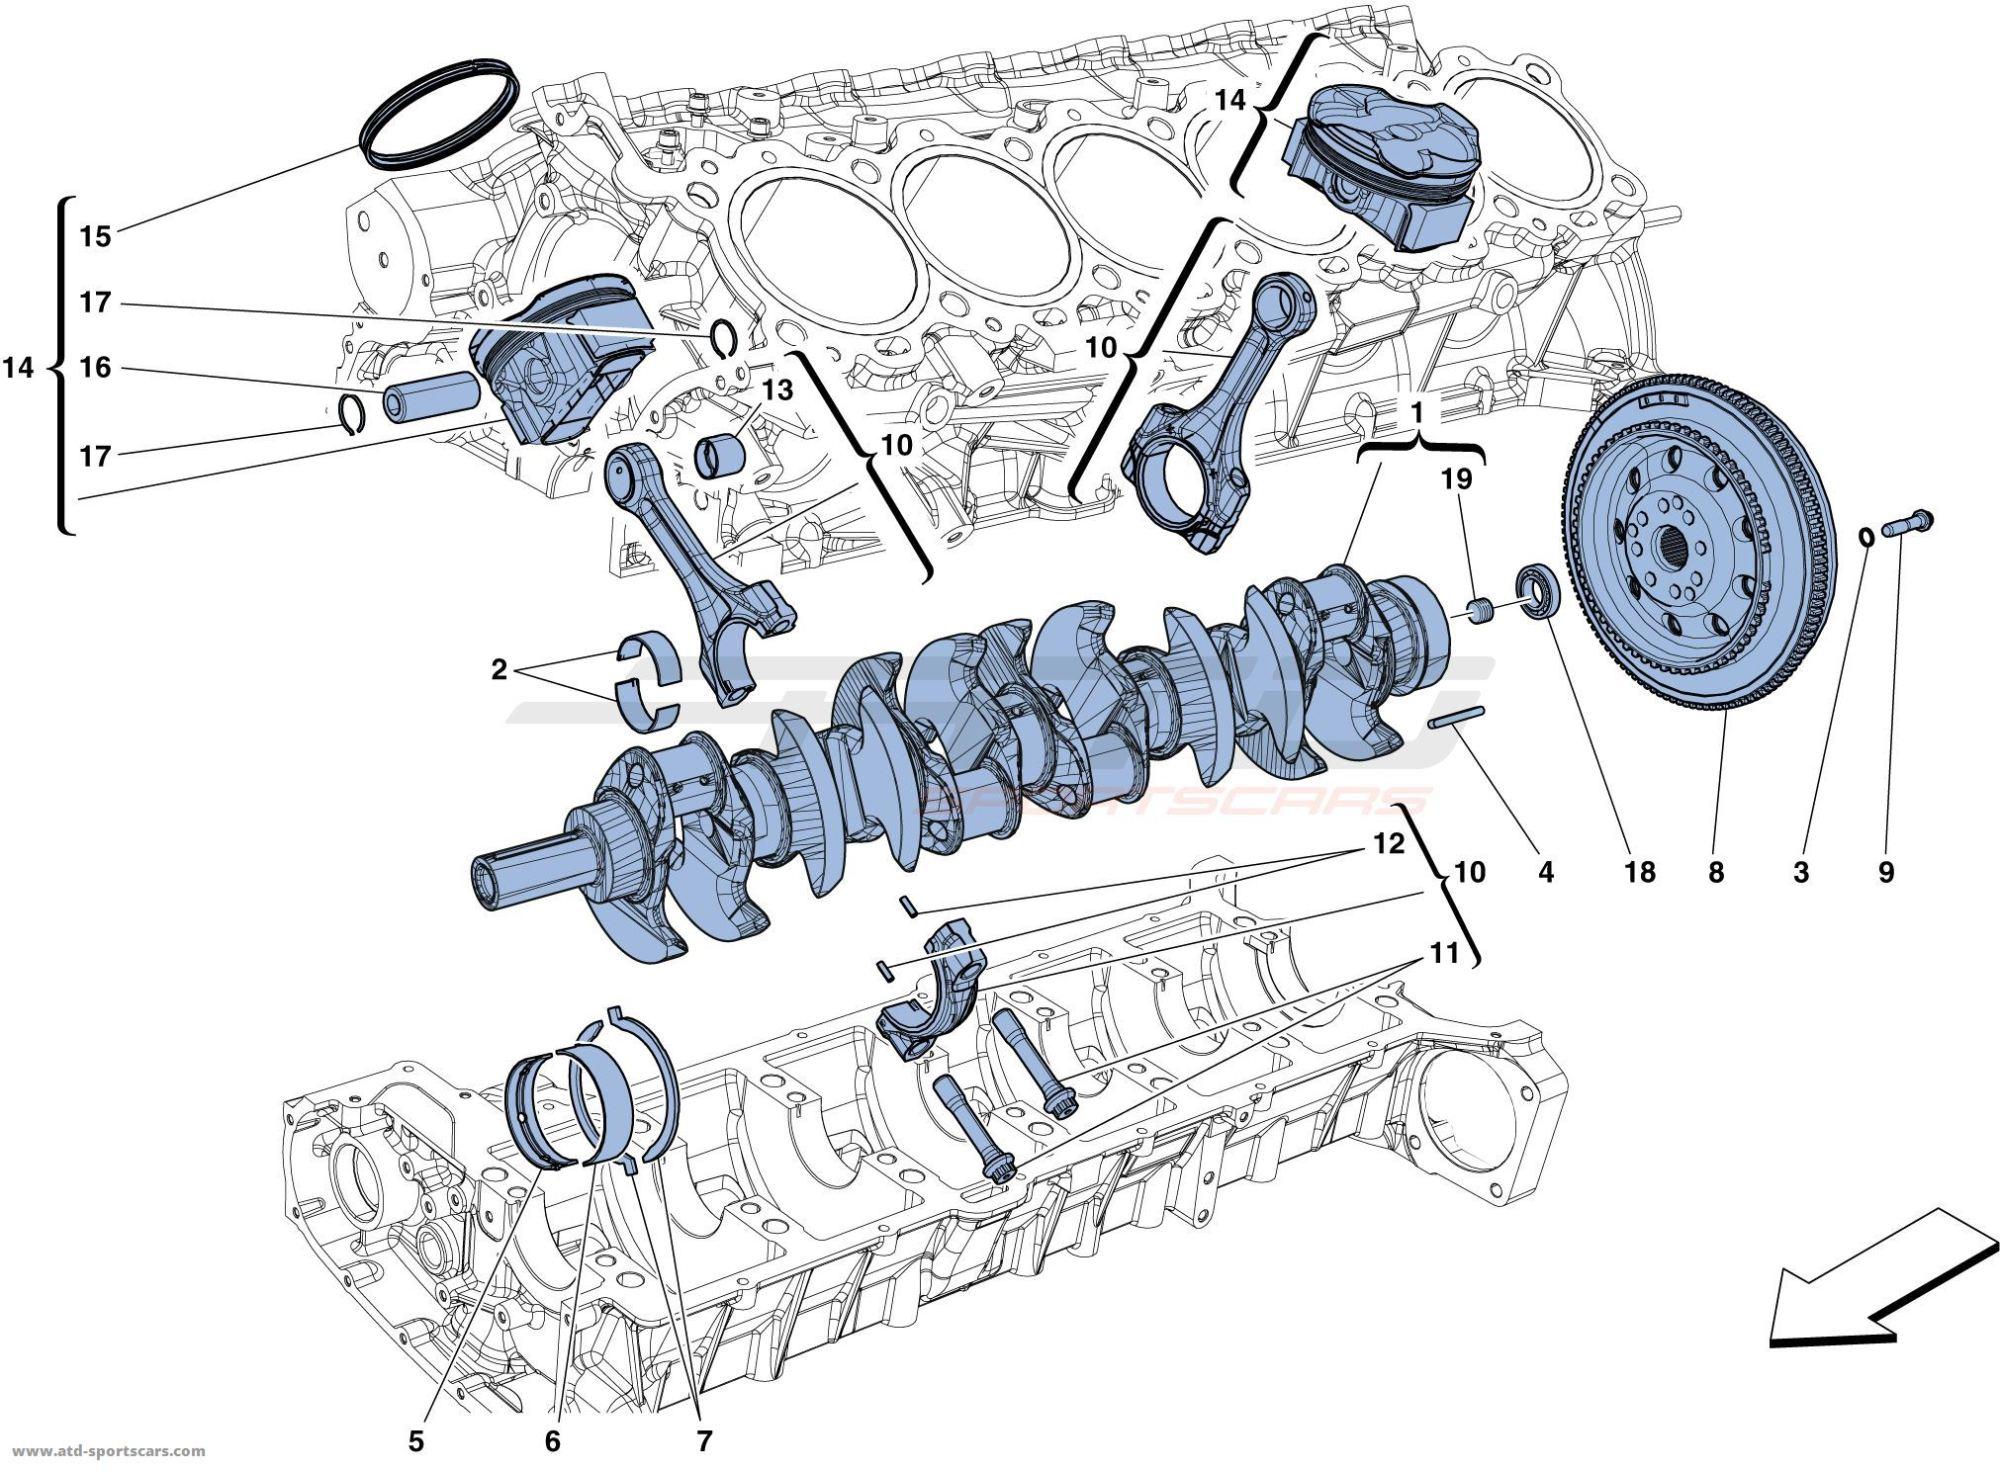 hight resolution of ferrari f12 engine diagram wiring diagram repair guides ferrari engine diagram ferrari engine diagram